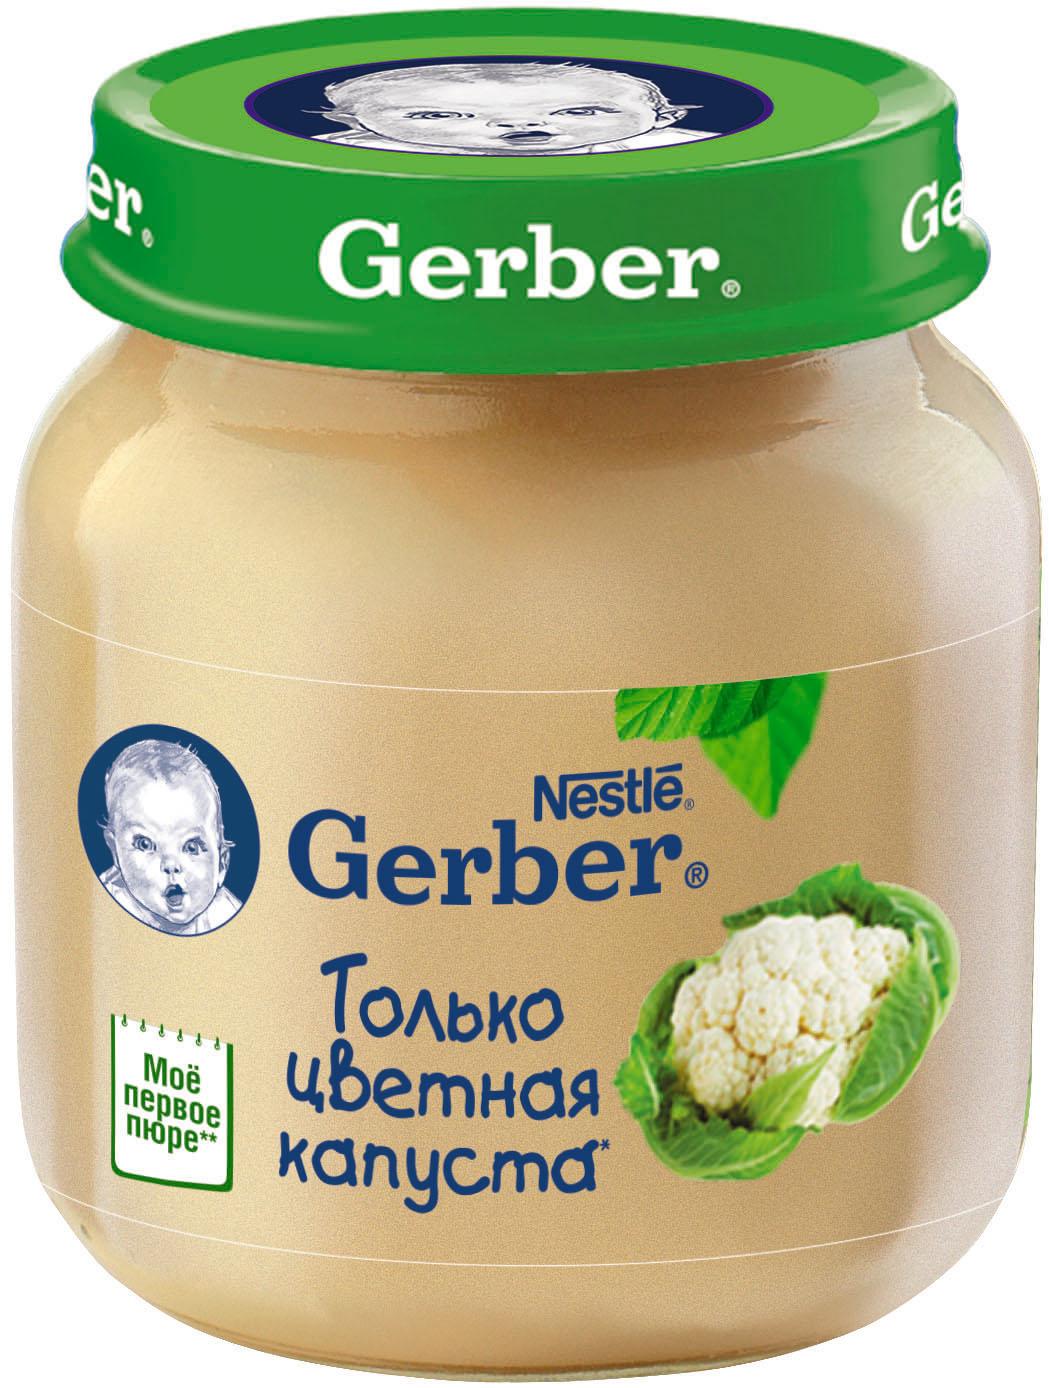 Пюре Gerber Gerber Только цветная капуста (с 4 месяцев) 130 г gerber пюре цветная капуста с 4 месяцев 12 шт по 80 г